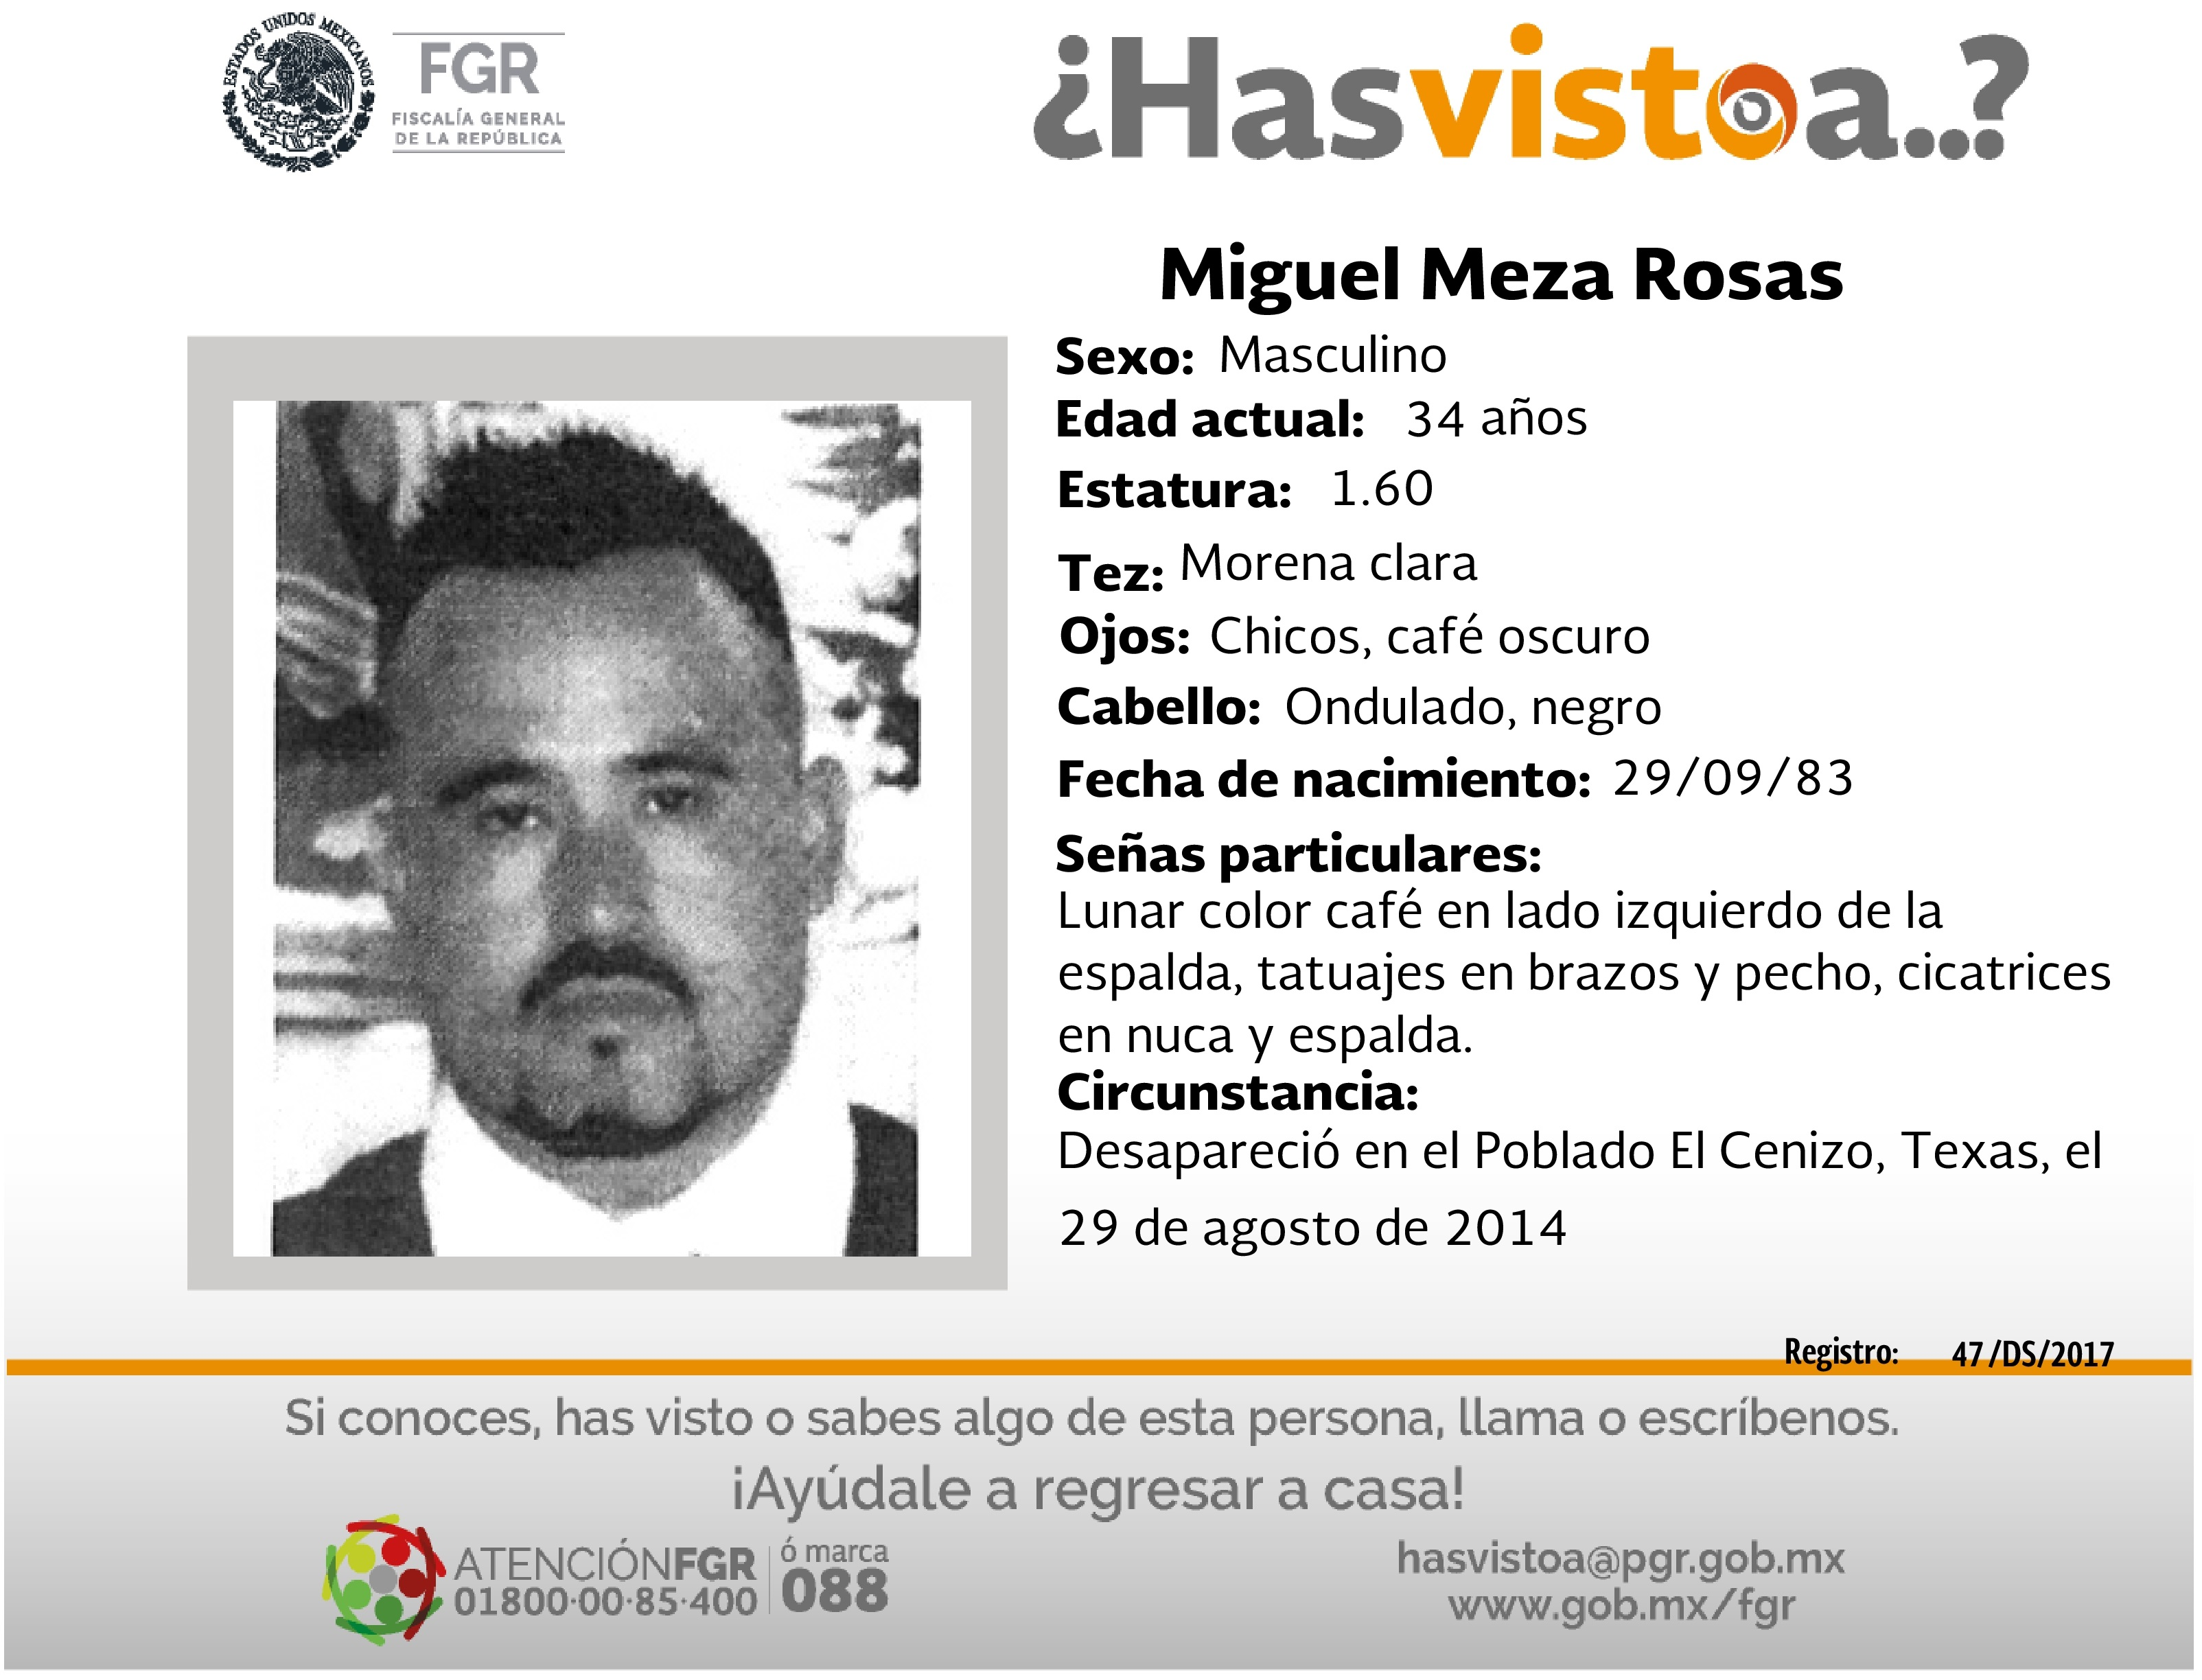 Ayúdanos a localizar a Miguel Meza Rosas